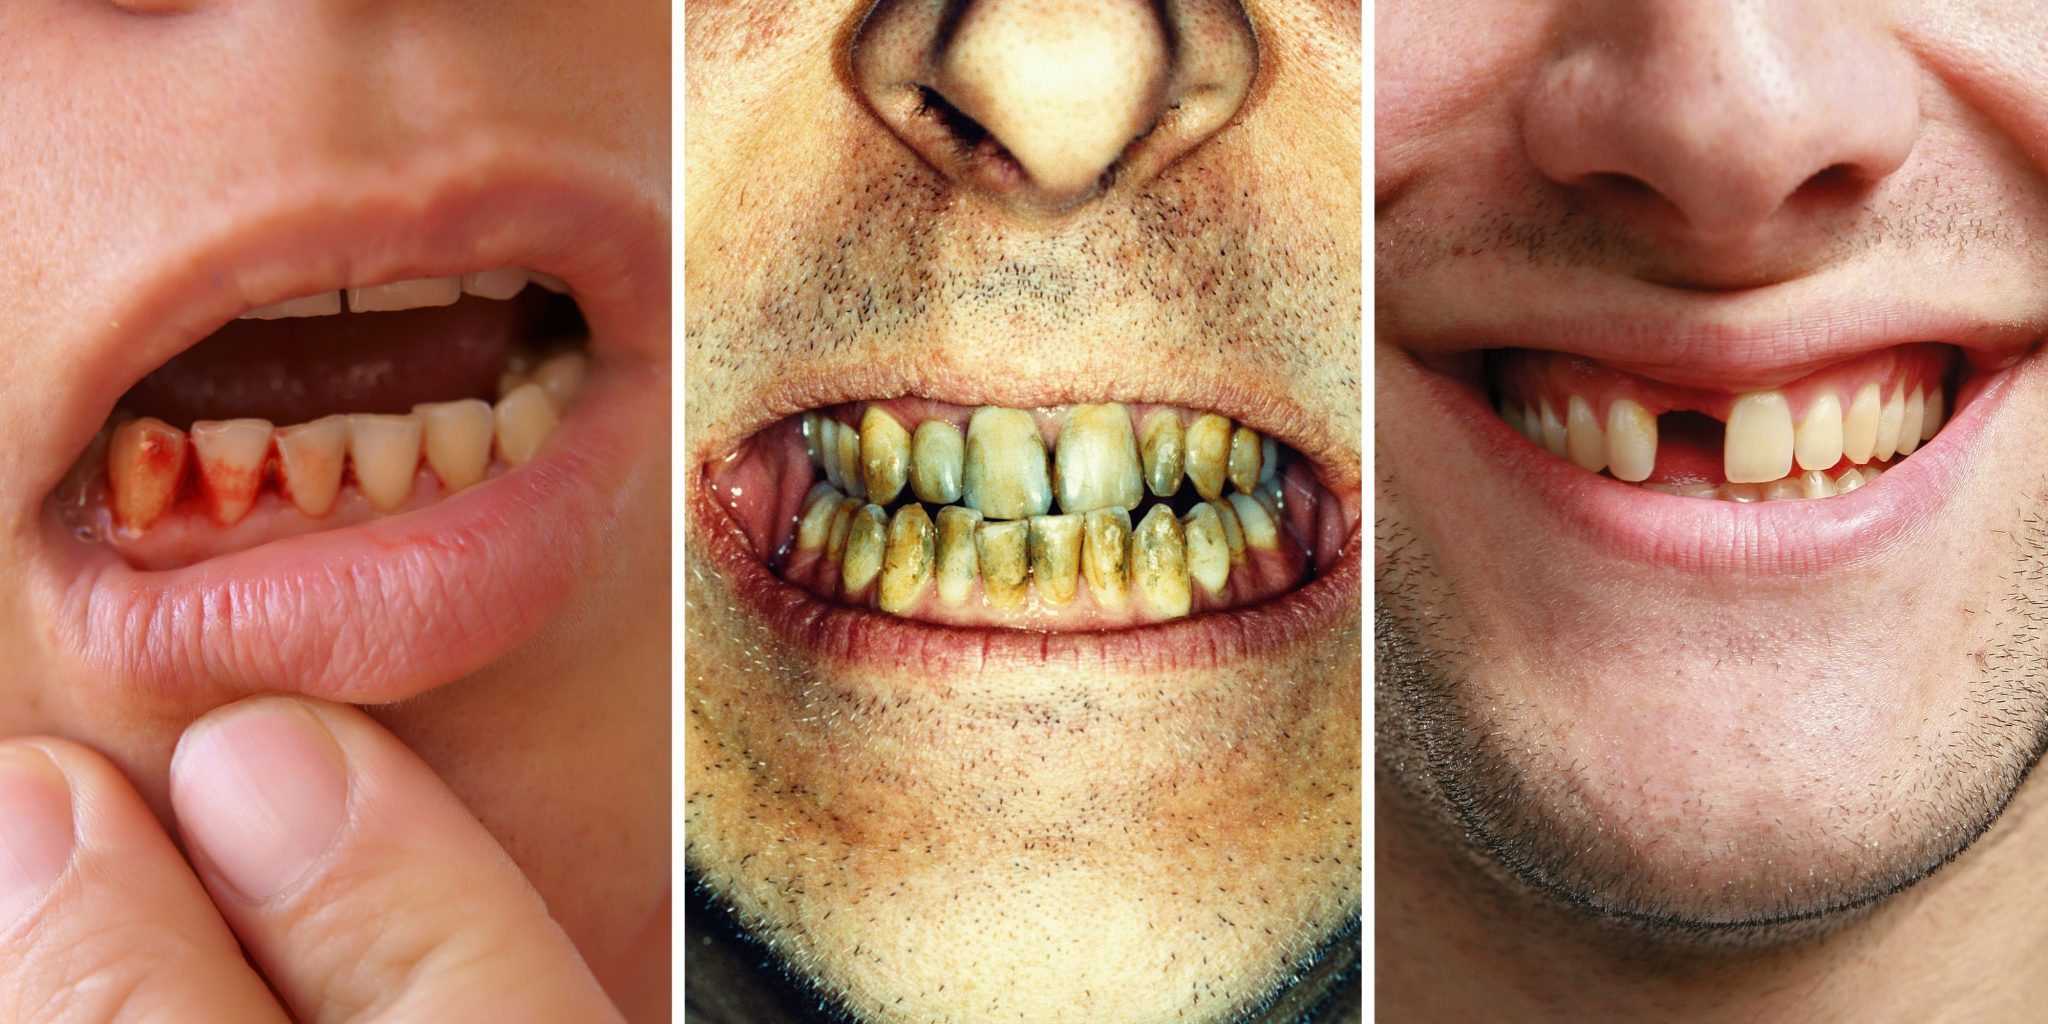 1491245438-1490902238-teeth-problems-health